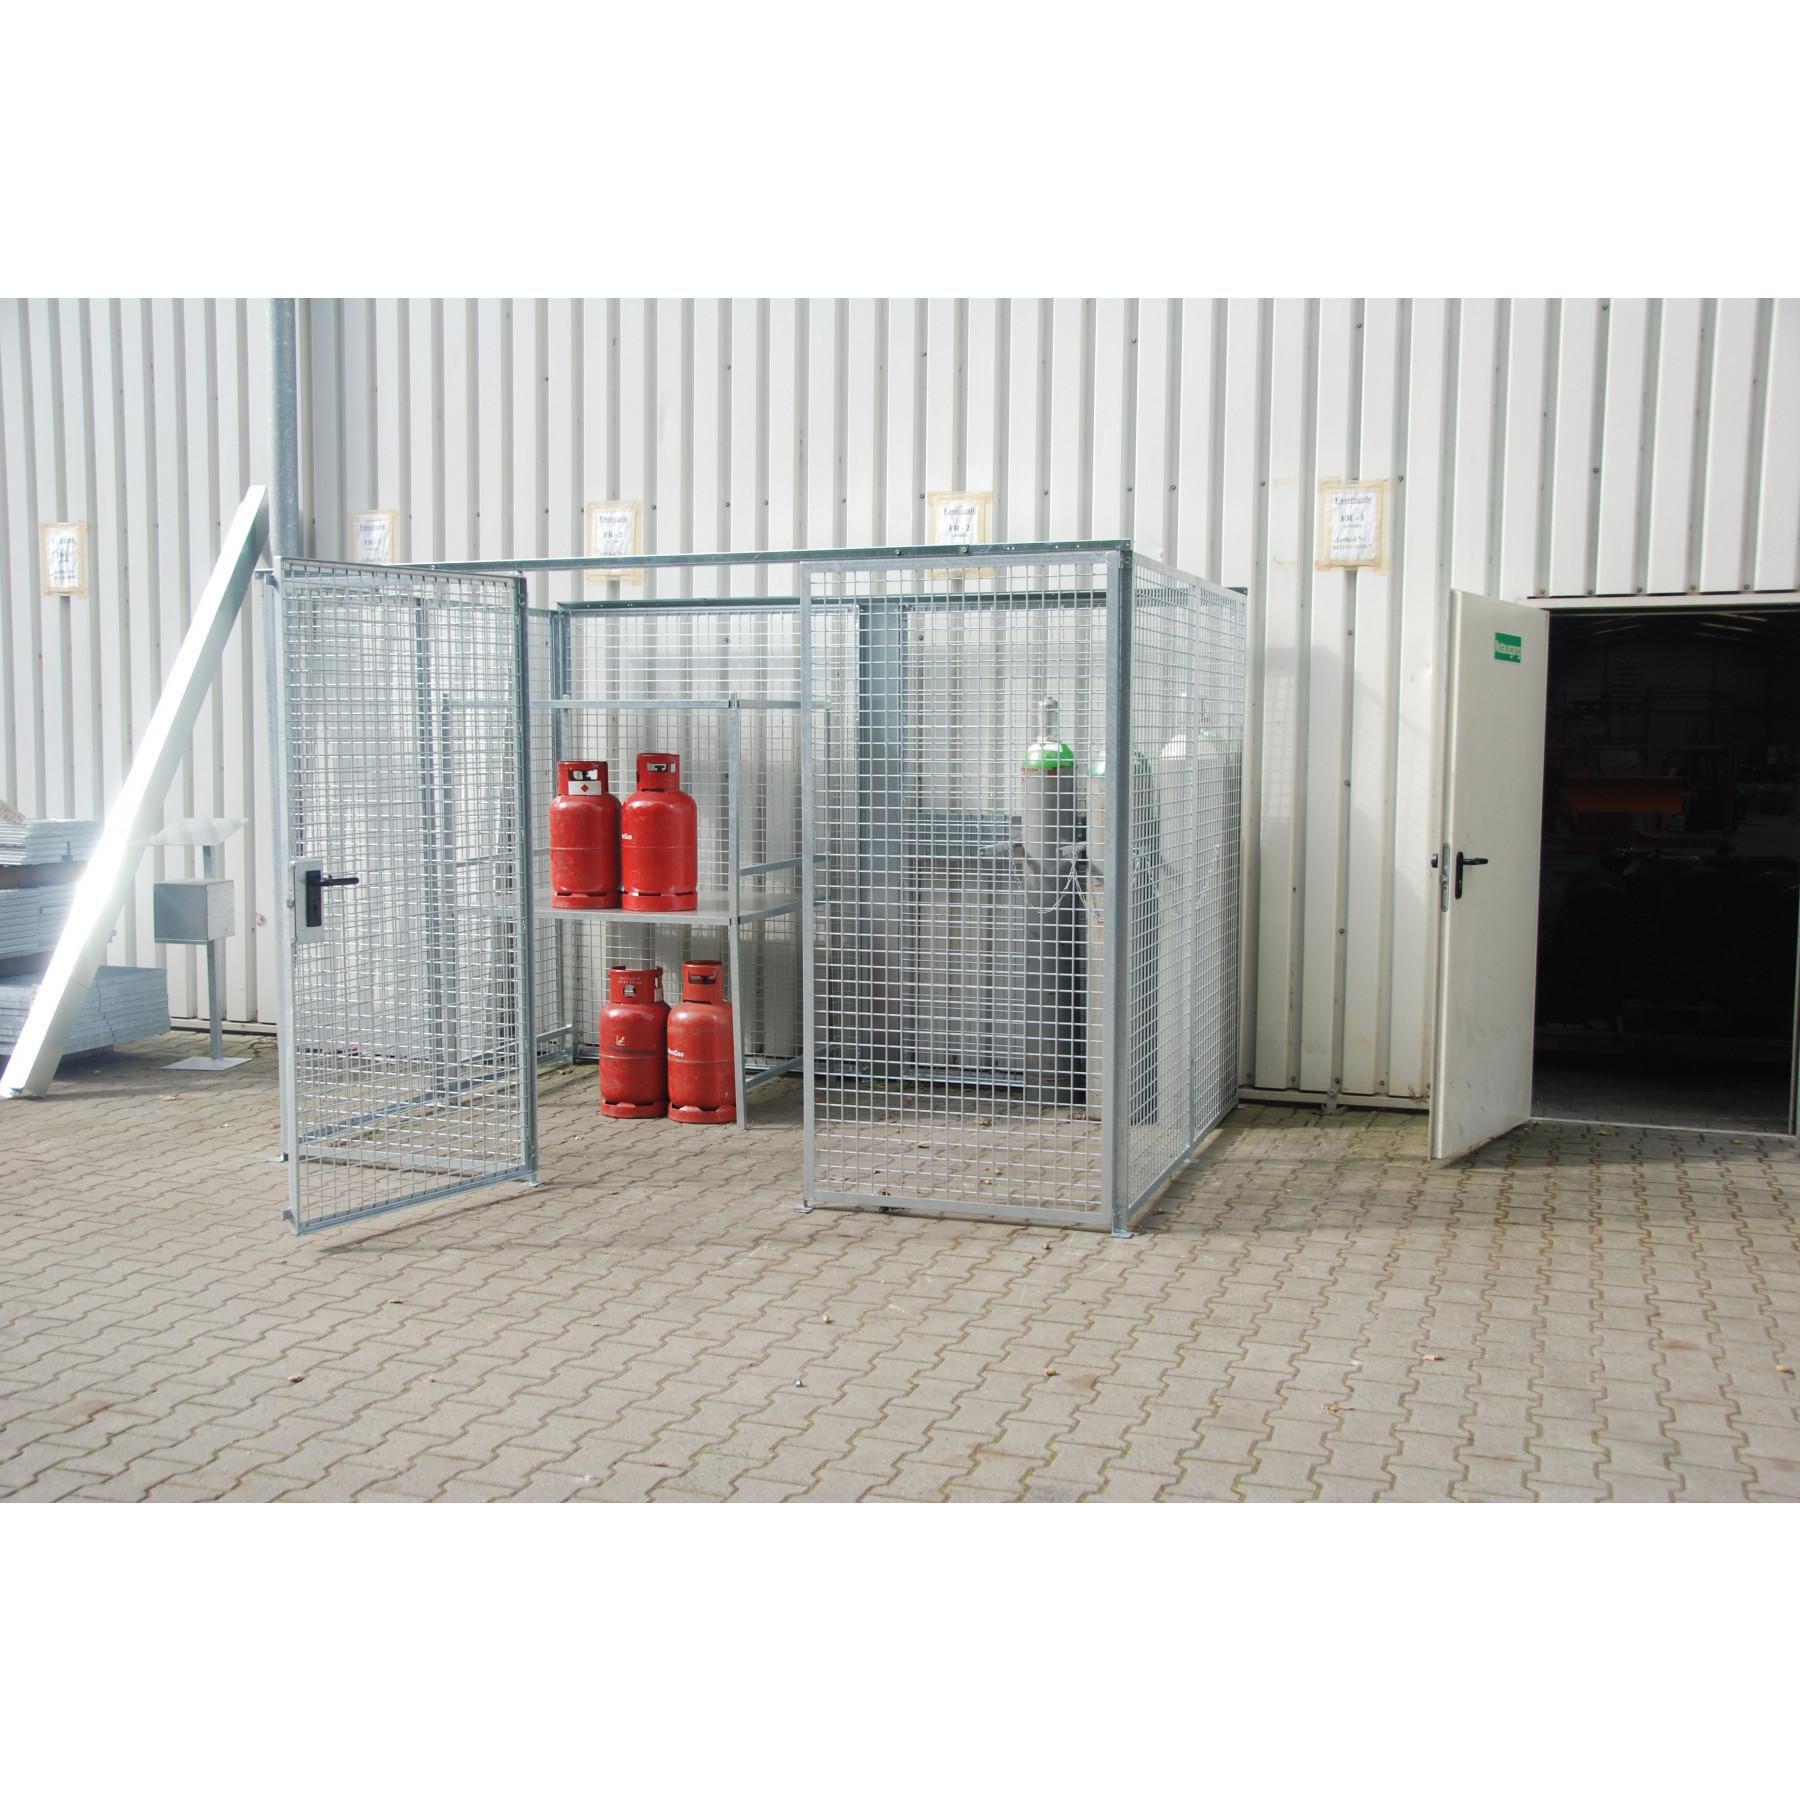 Gasflessencontainer zonder dak voor 78 gasflessen, GFC-M4